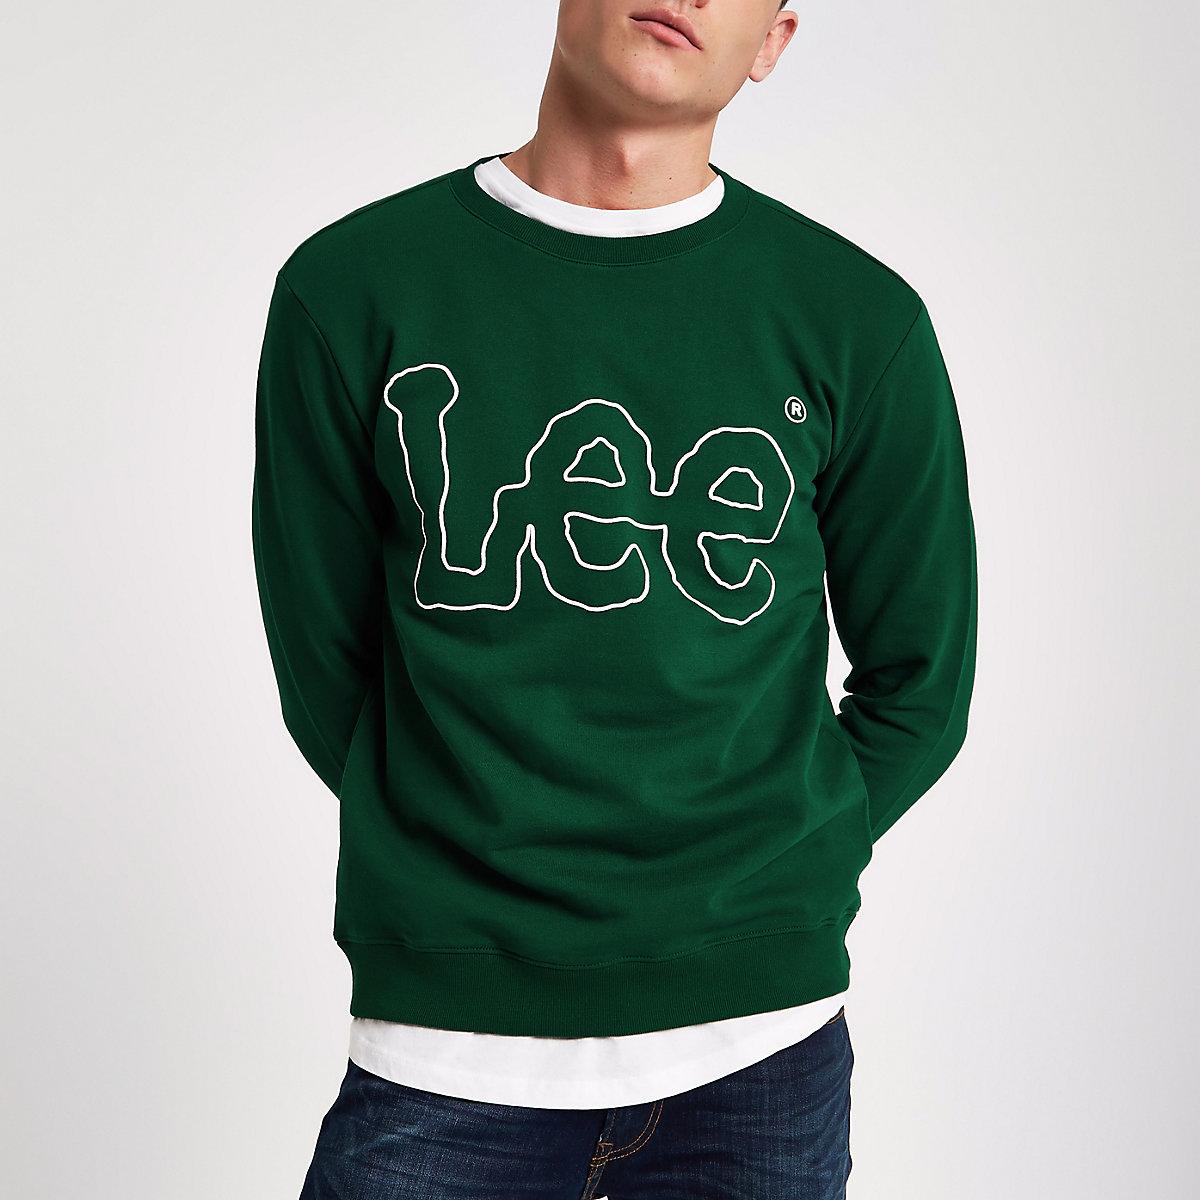 Lee dark green logo print crew sweatshirt